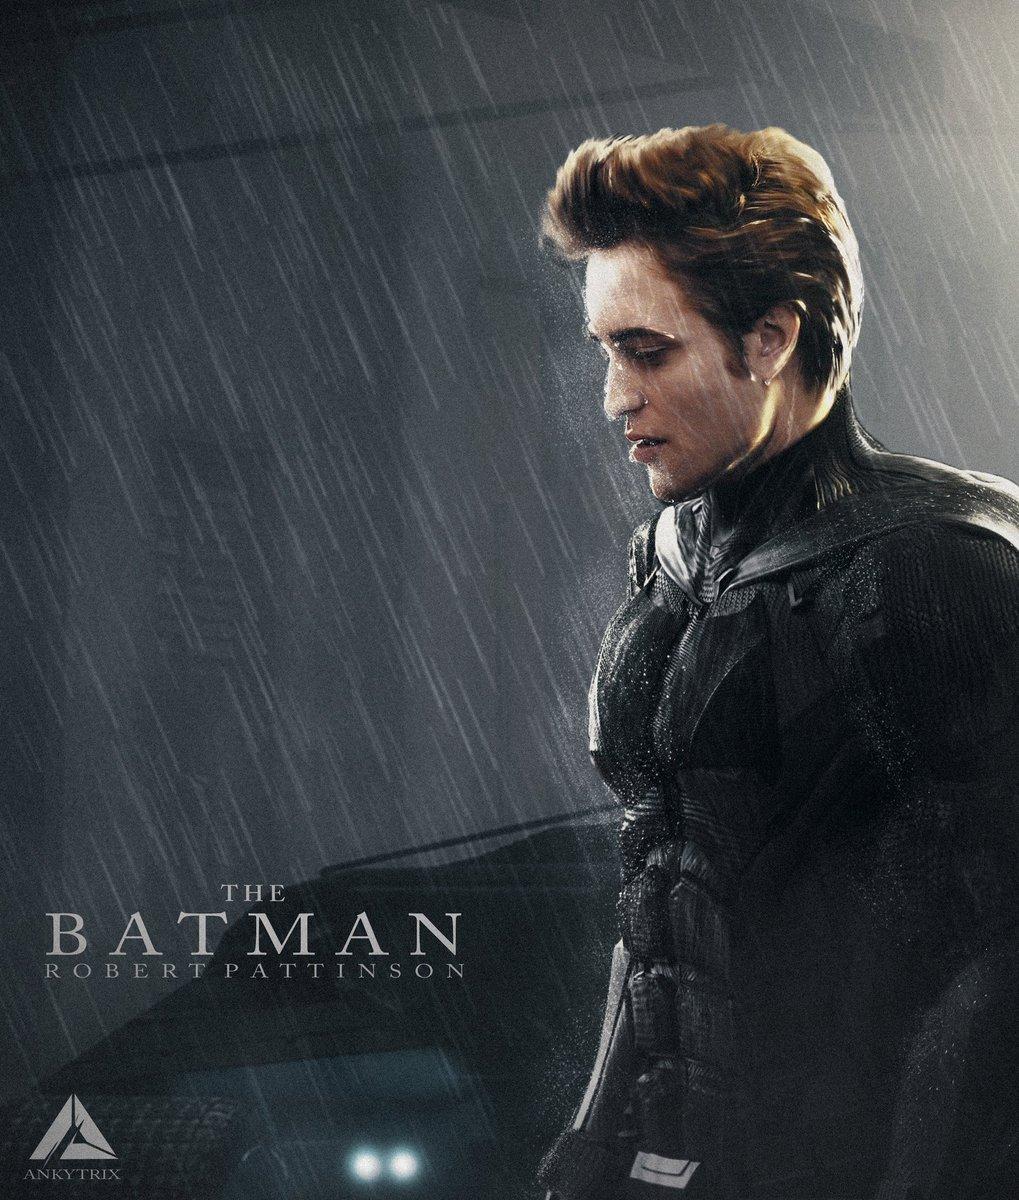 @mattreevesLA The Batman 🦇 #RobertPattinson . .  .  .  .  Follow @ankytrix_art for more ∆ #Batman #Batman80 #DCEU #dccomics #TheBatman #RobertPattinson #benaffleck #BatmanvSuperman #JusticeLeague #Joker  #Superman #AvengersEndgame #SpiderMan #WonderWoman #Aquaman #batmanhush